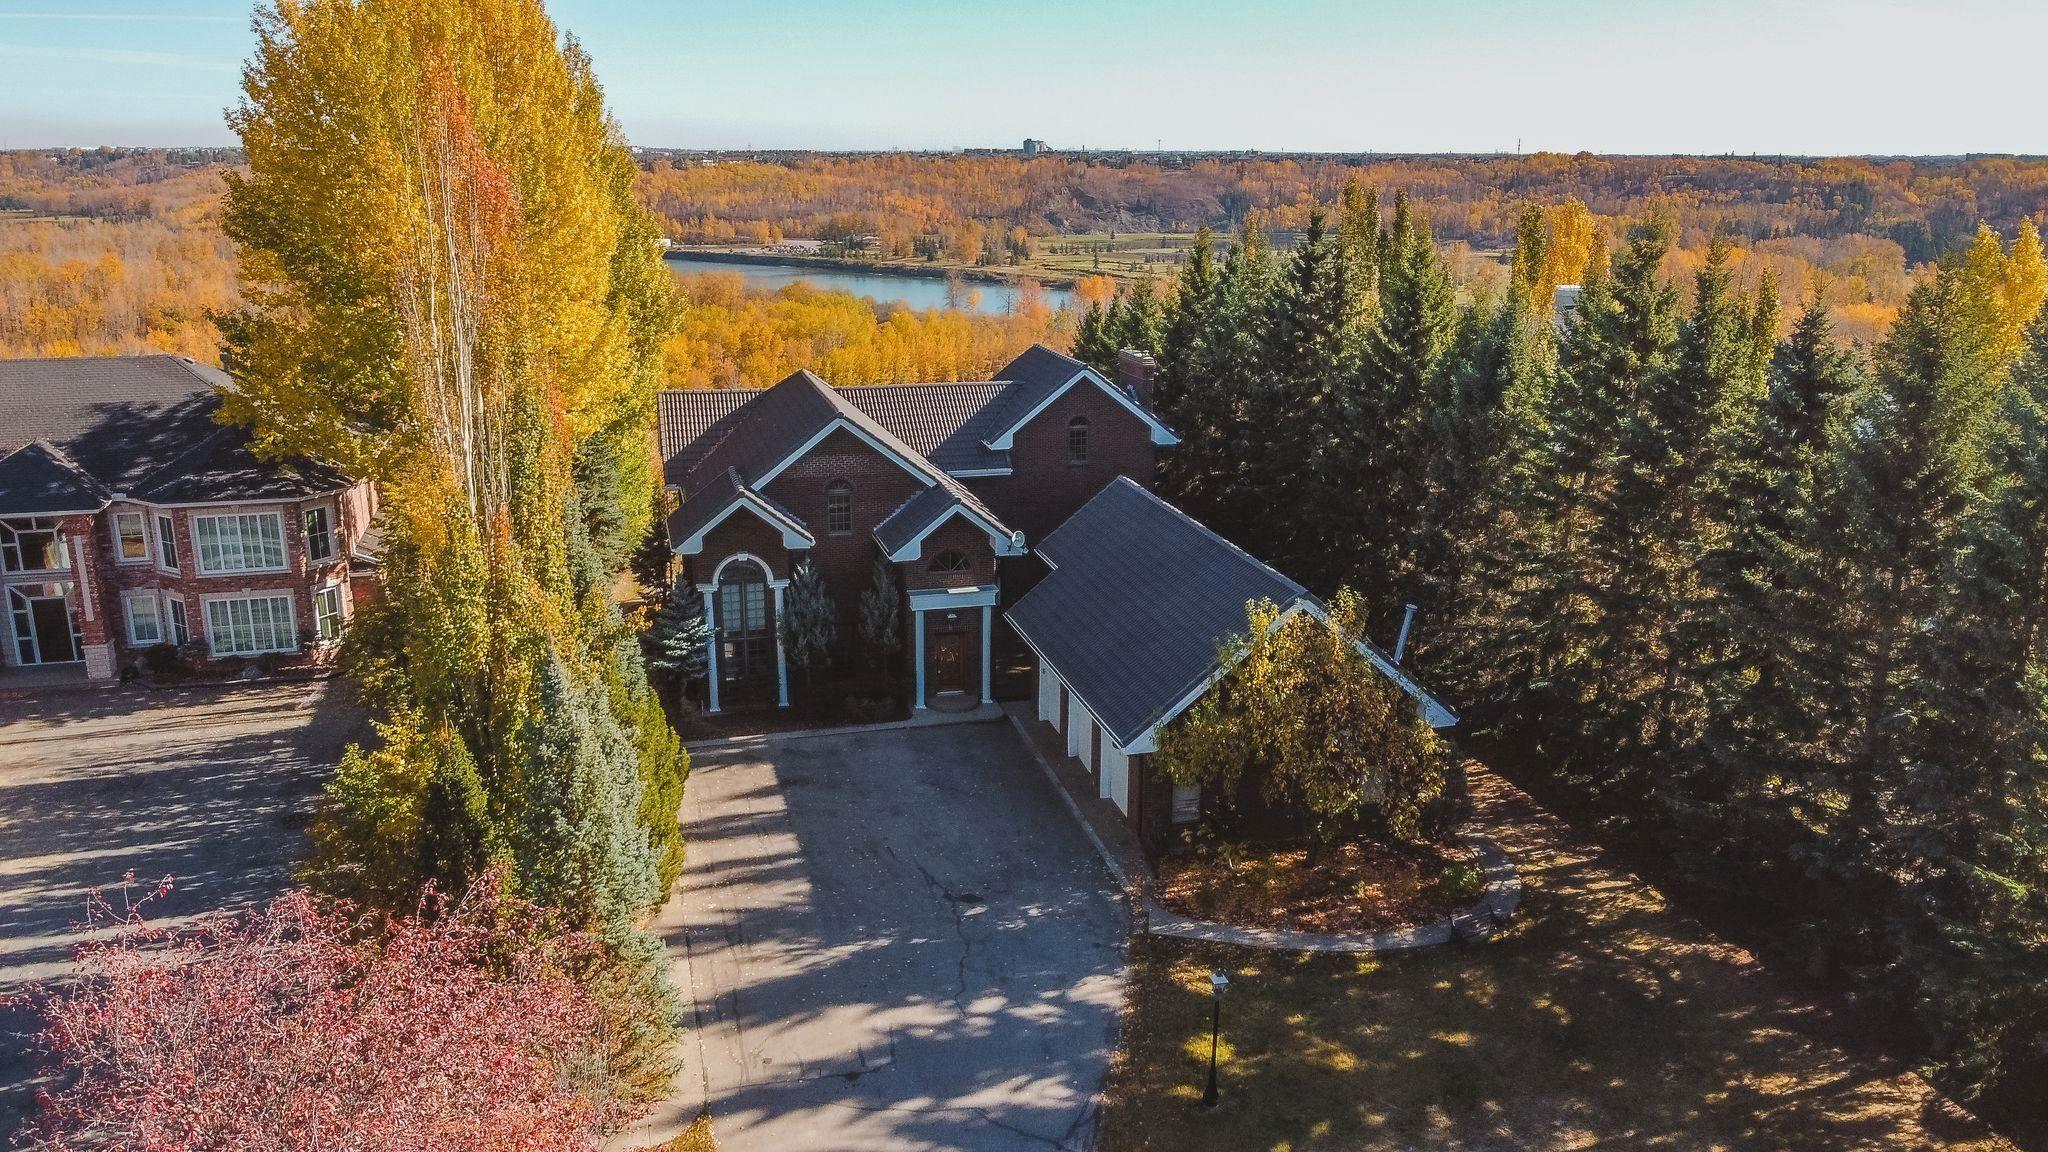 Main Photo: 220 GRANDISLE Point in Edmonton: Zone 57 House for sale : MLS®# E4266454